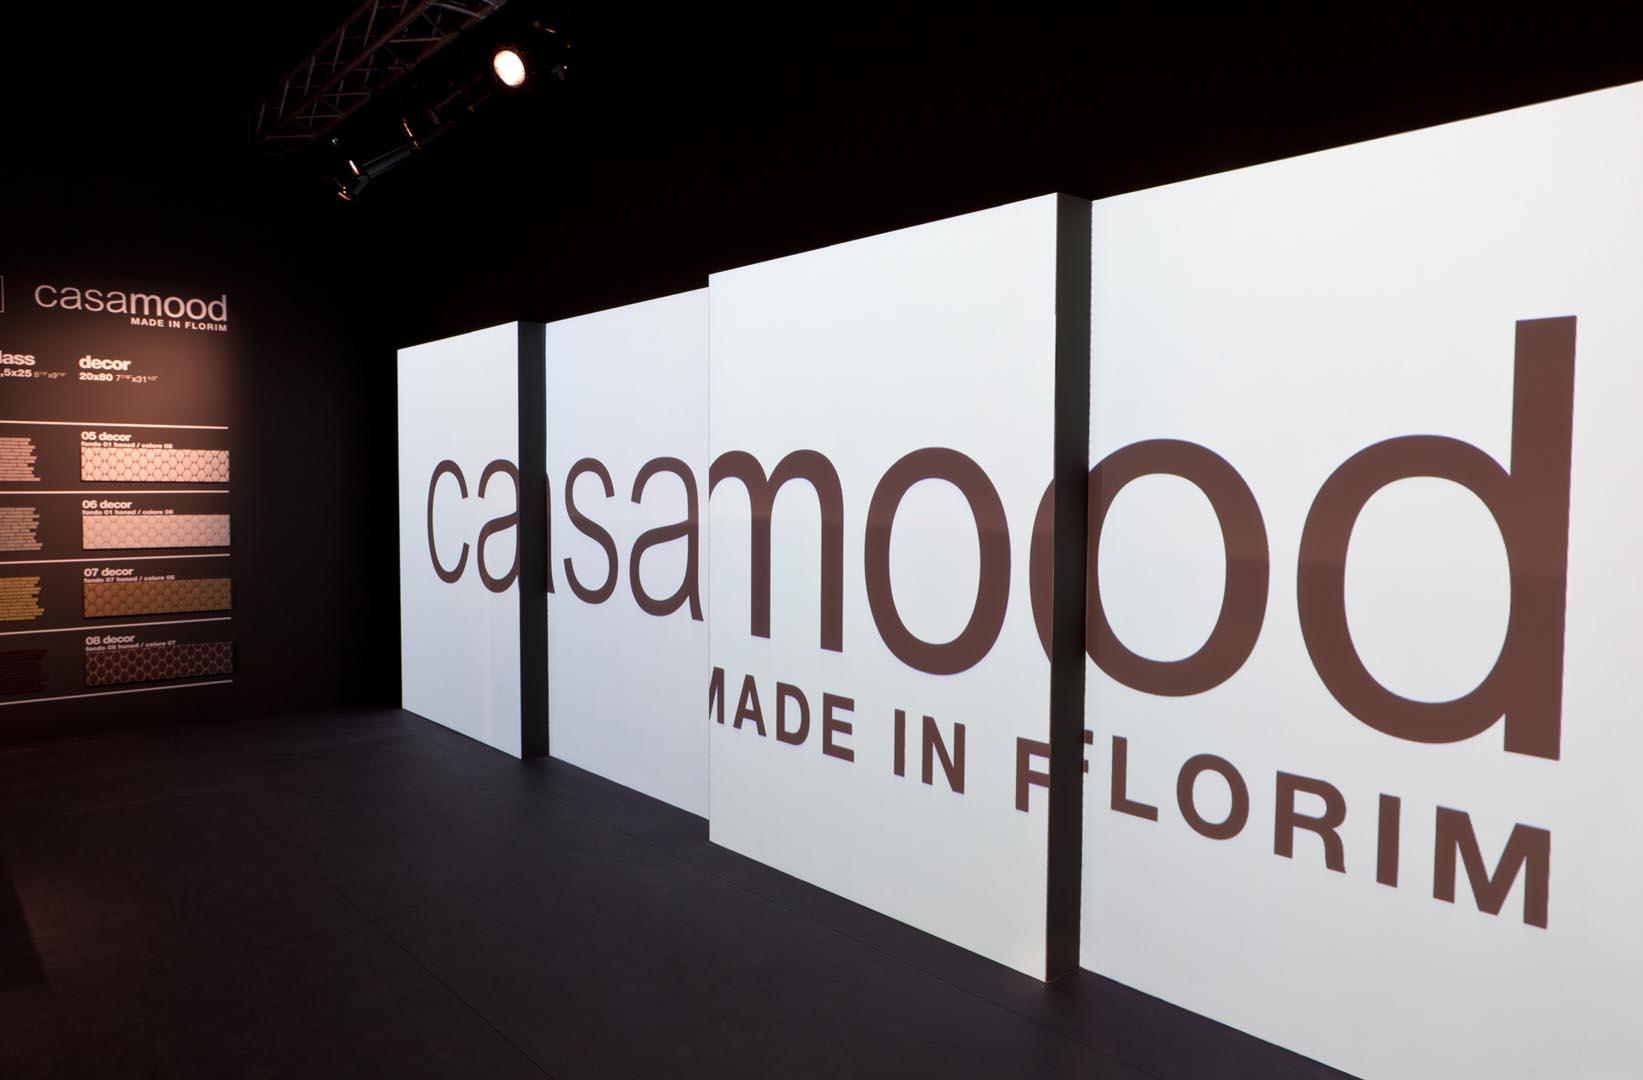 Casamood Florim-Cersaie-installazione audio video-lorri